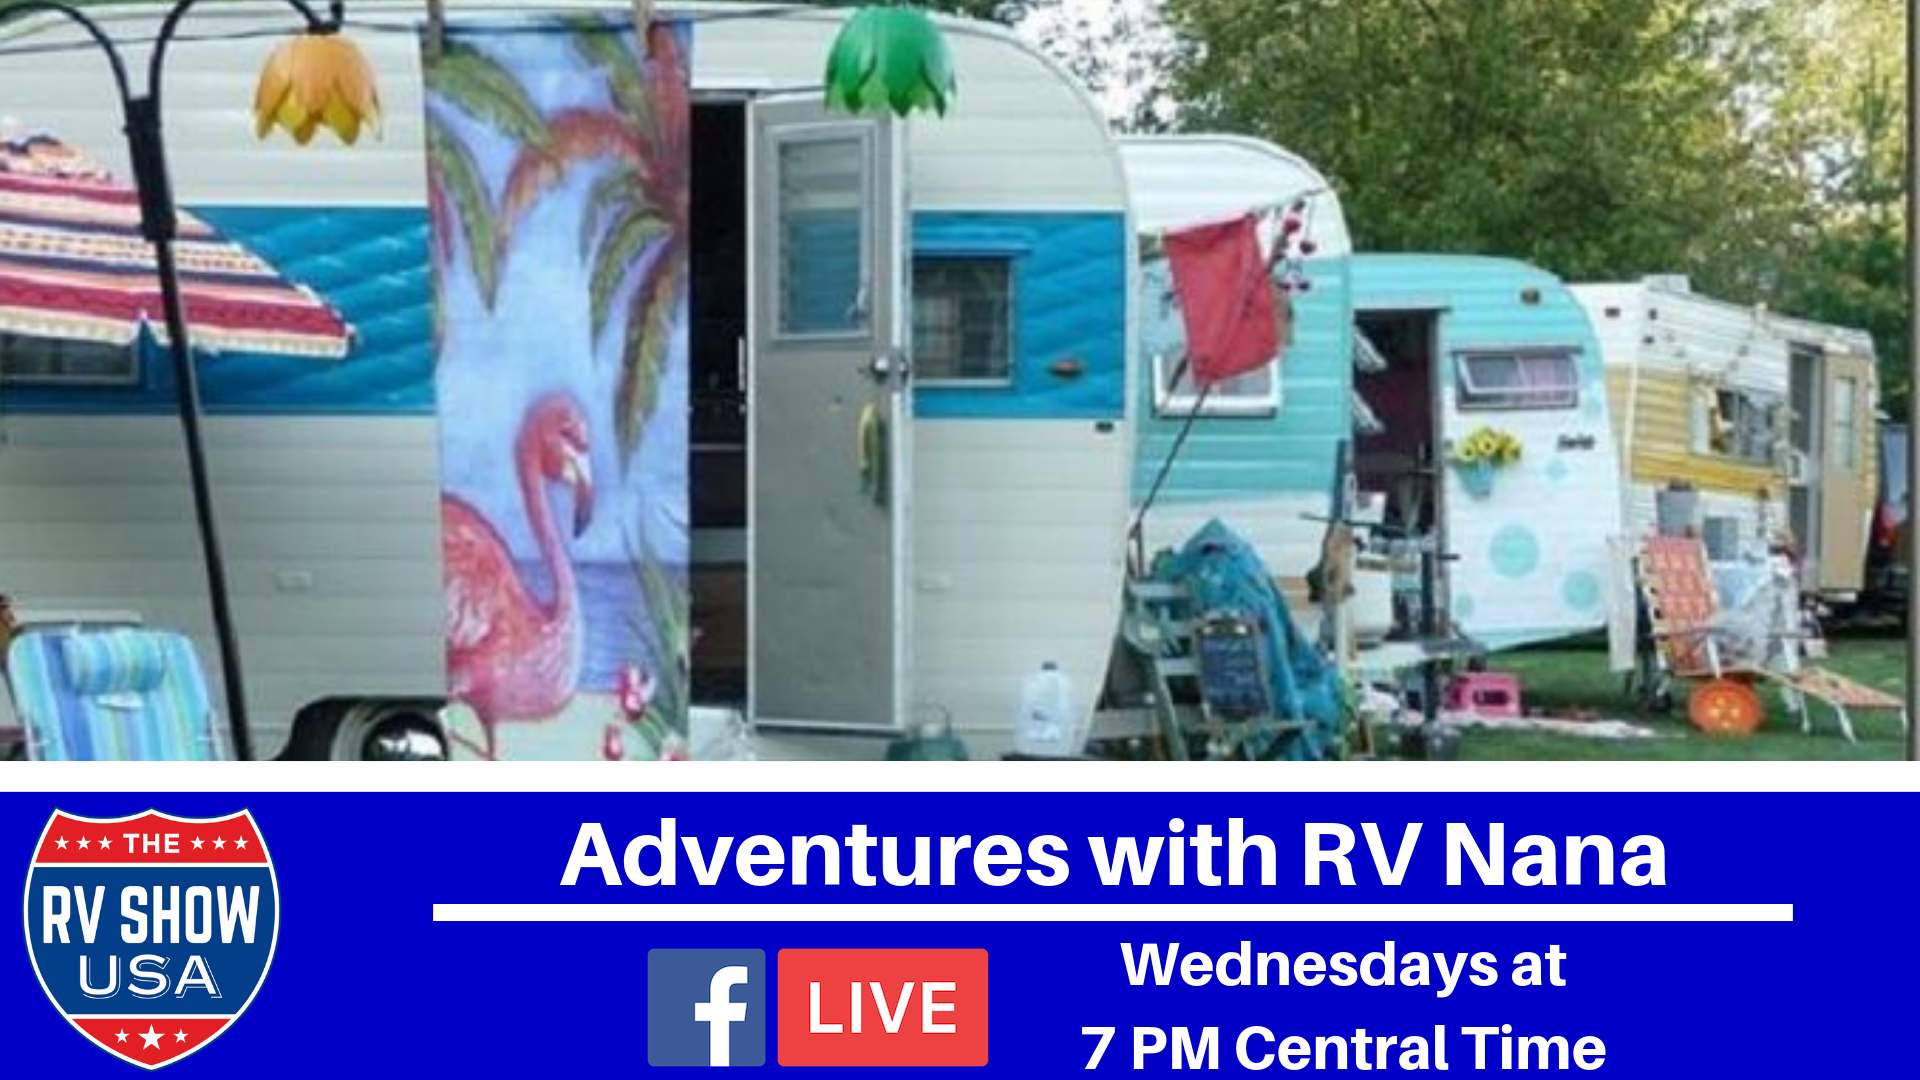 Artwork for Adventures with RV Nana